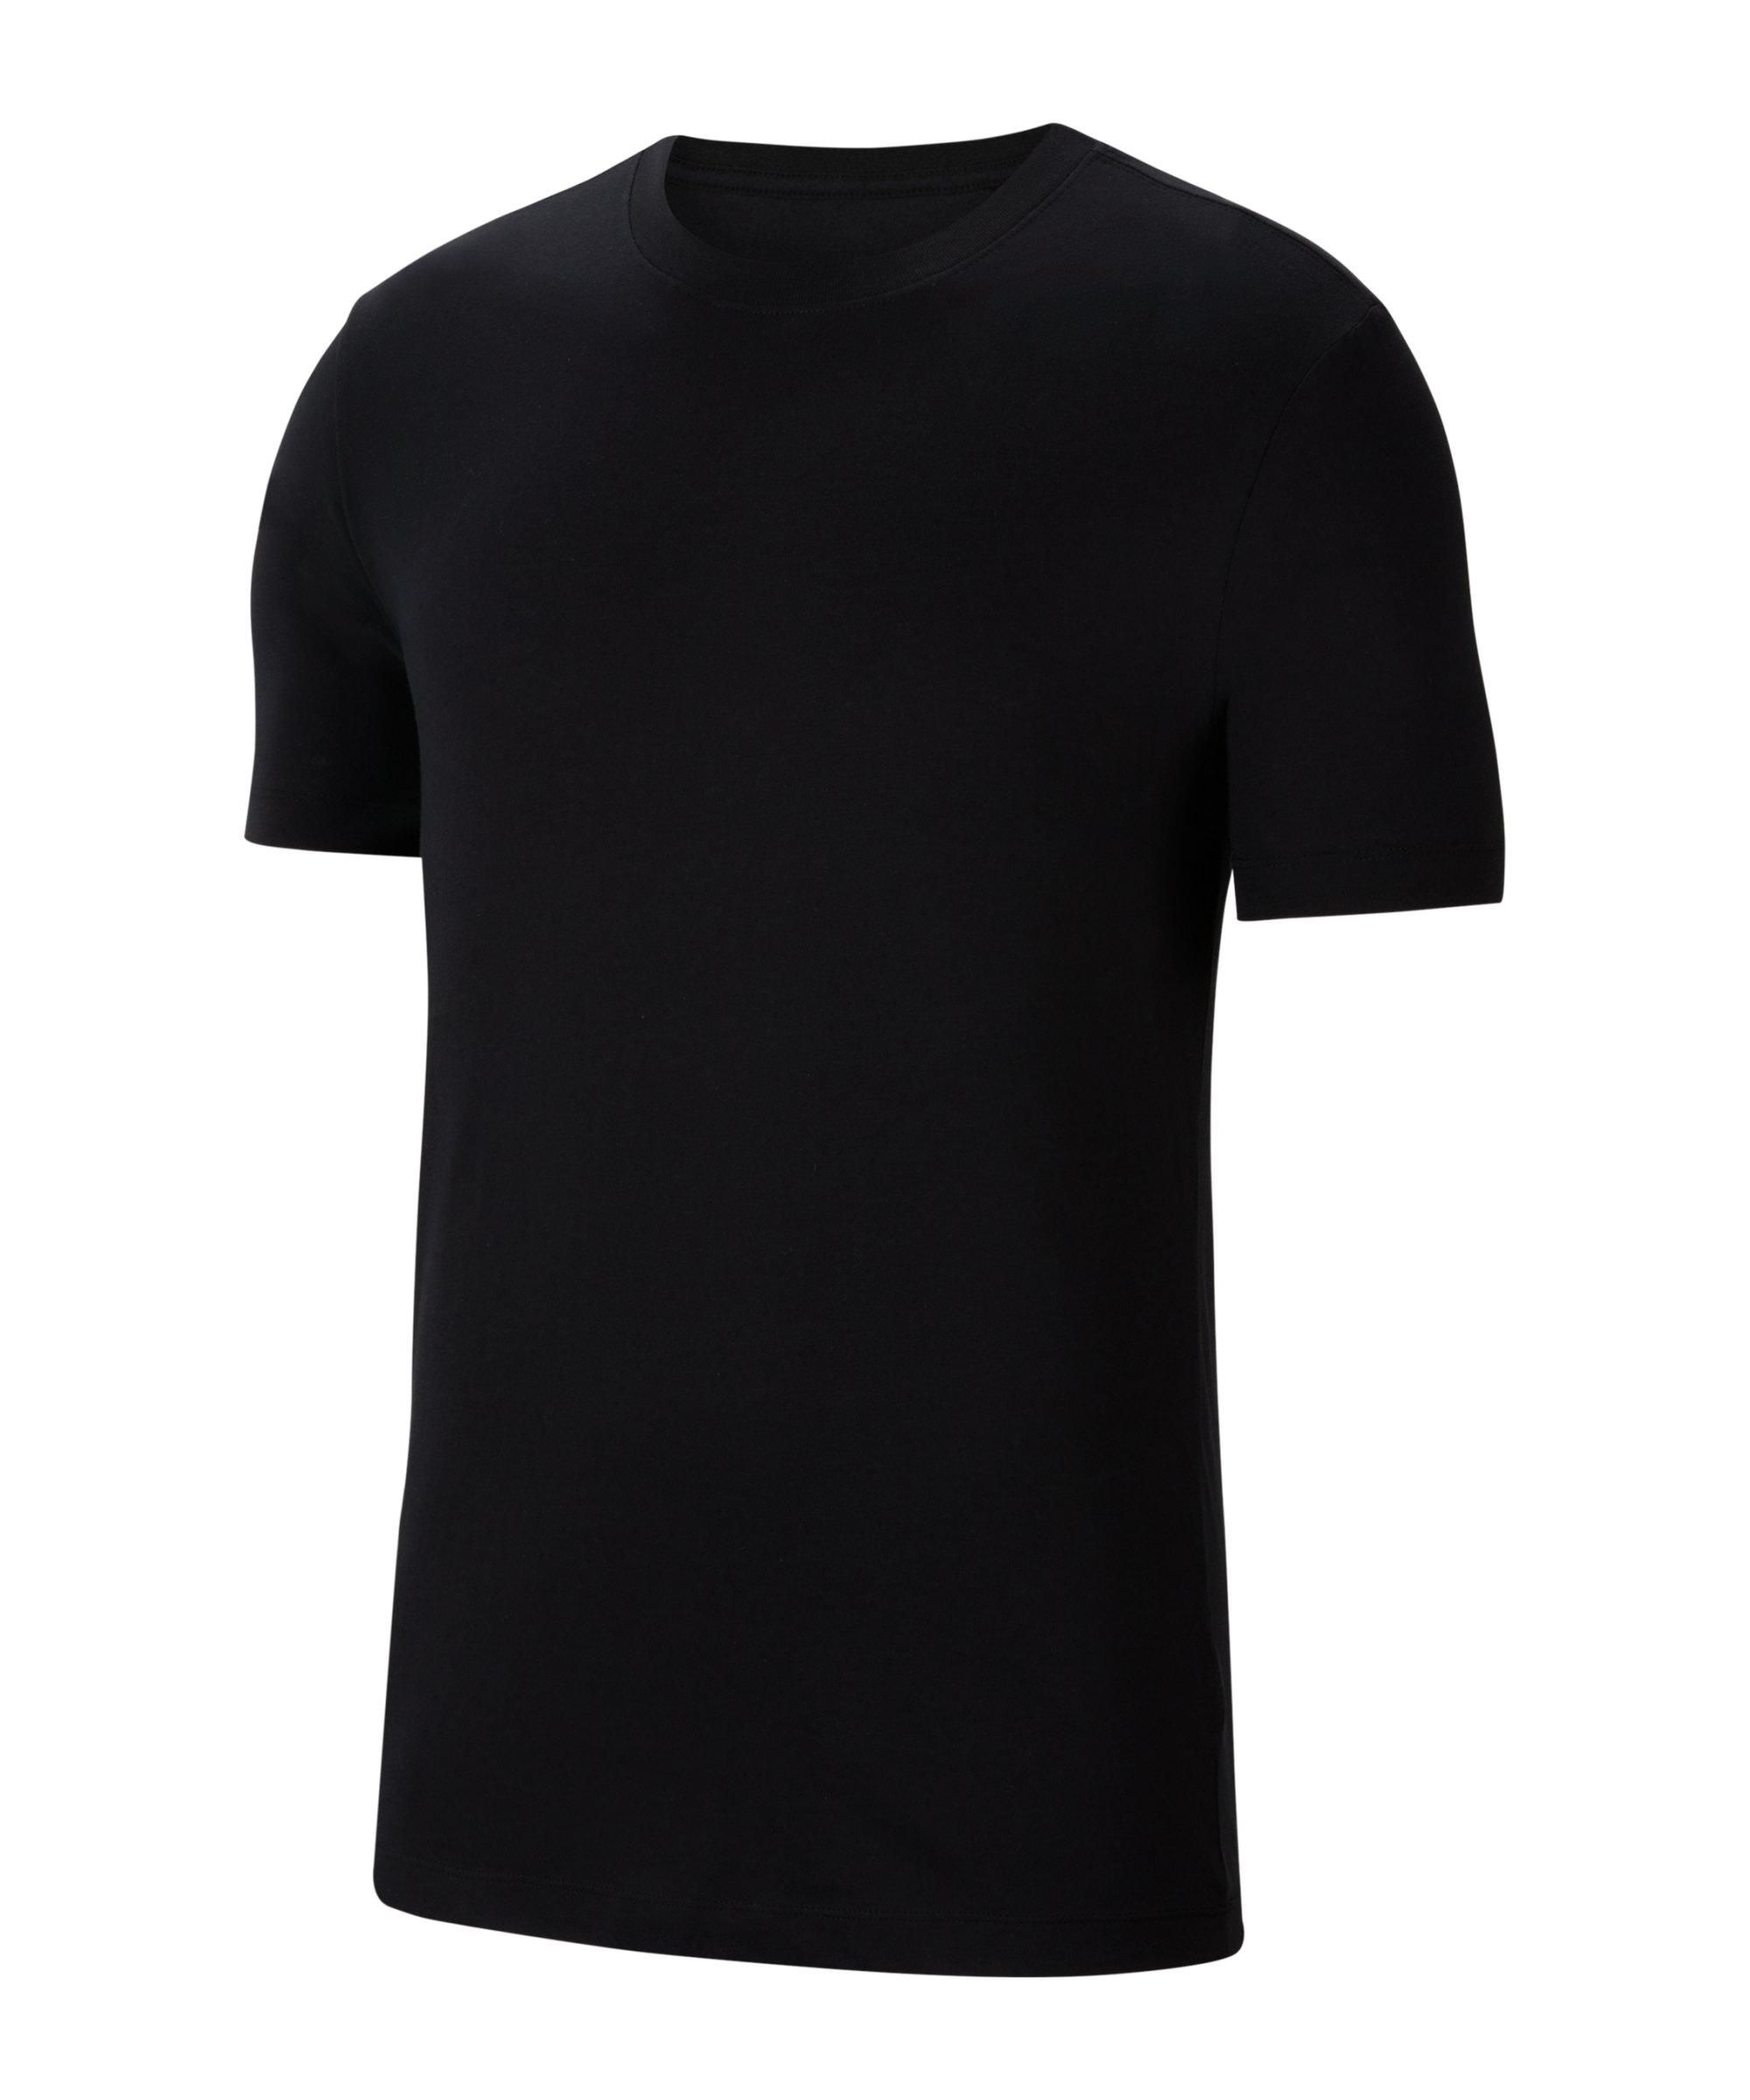 Nike Park 20 T-Shirt Schwarz Weiss F010 - schwarz